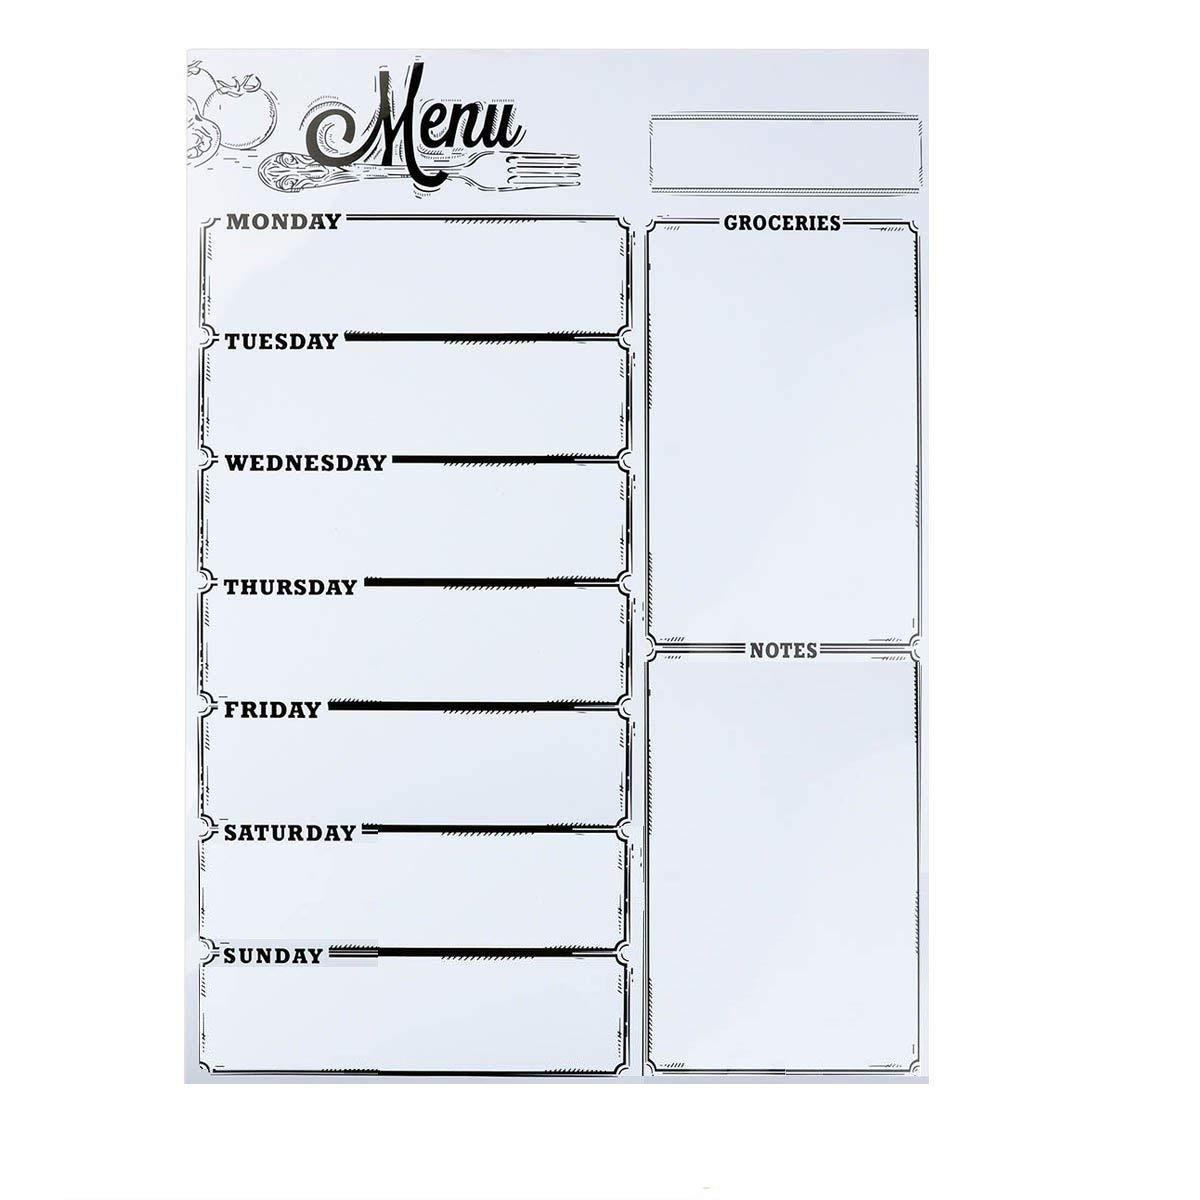 "Weekly Board Loftstyle Magnetic Refrigerator Chalkboard Weekly Menu Meal Planner Dry Erase Board For Refrigerator Dinner List Note Schedule Board Shopping List Memo Board 16""X 12"""